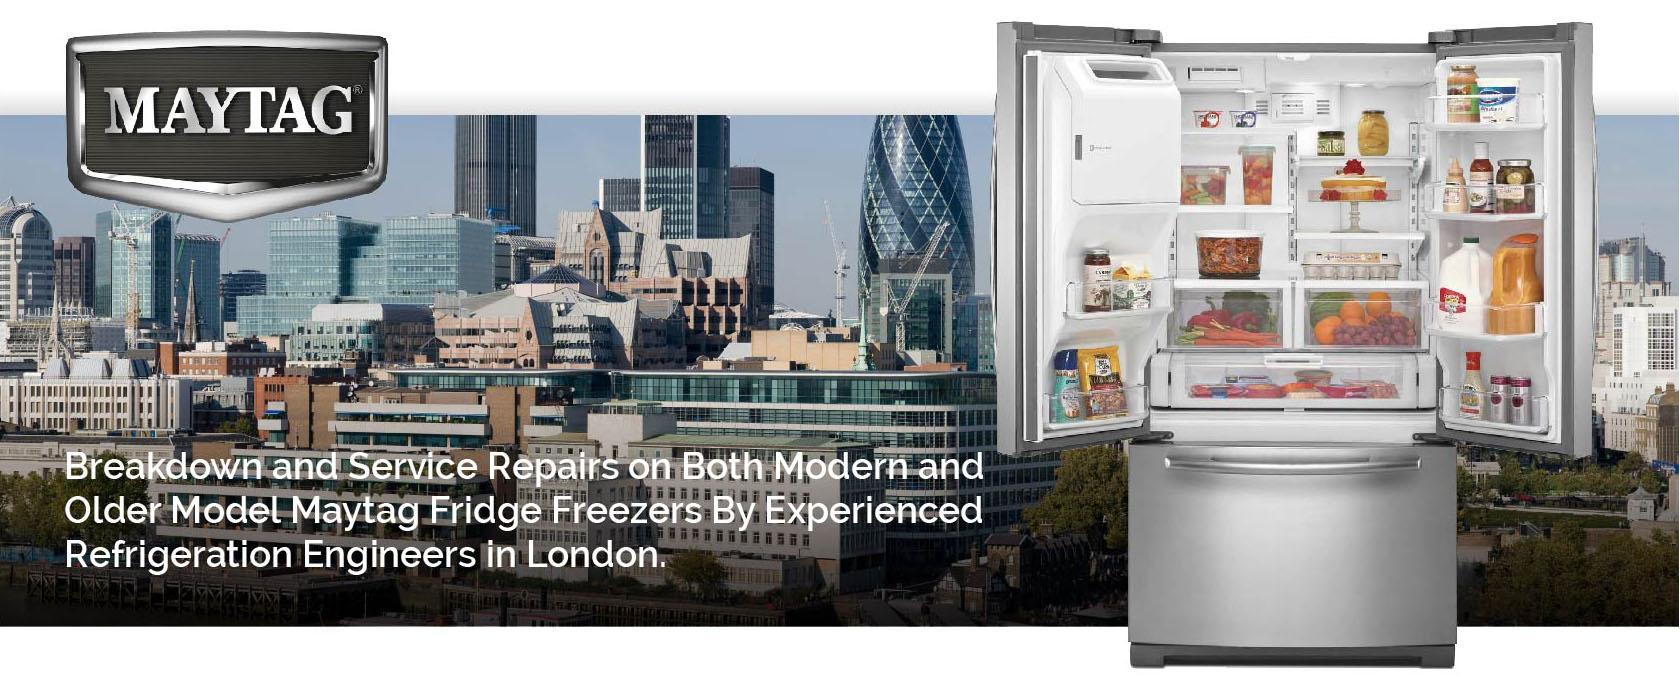 Spare Parts For Maytag Fridge Freezers | Kayamotor.co on